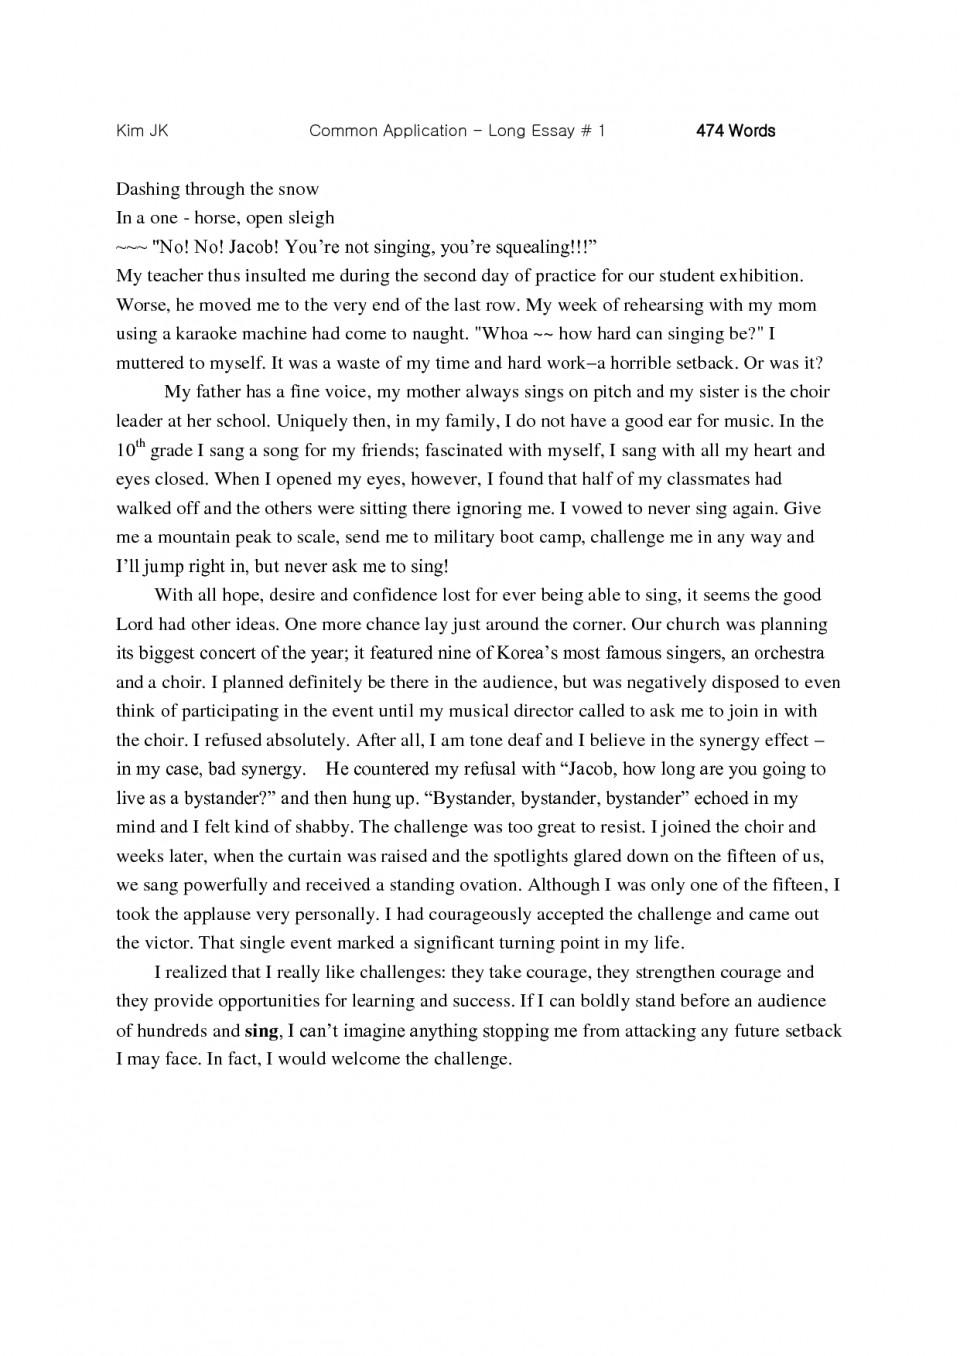 001 College Essay Word Limit Good Common App Essays Resume Writing Application Help Cnessayjuvi Impressive Apply Texas 2019 960